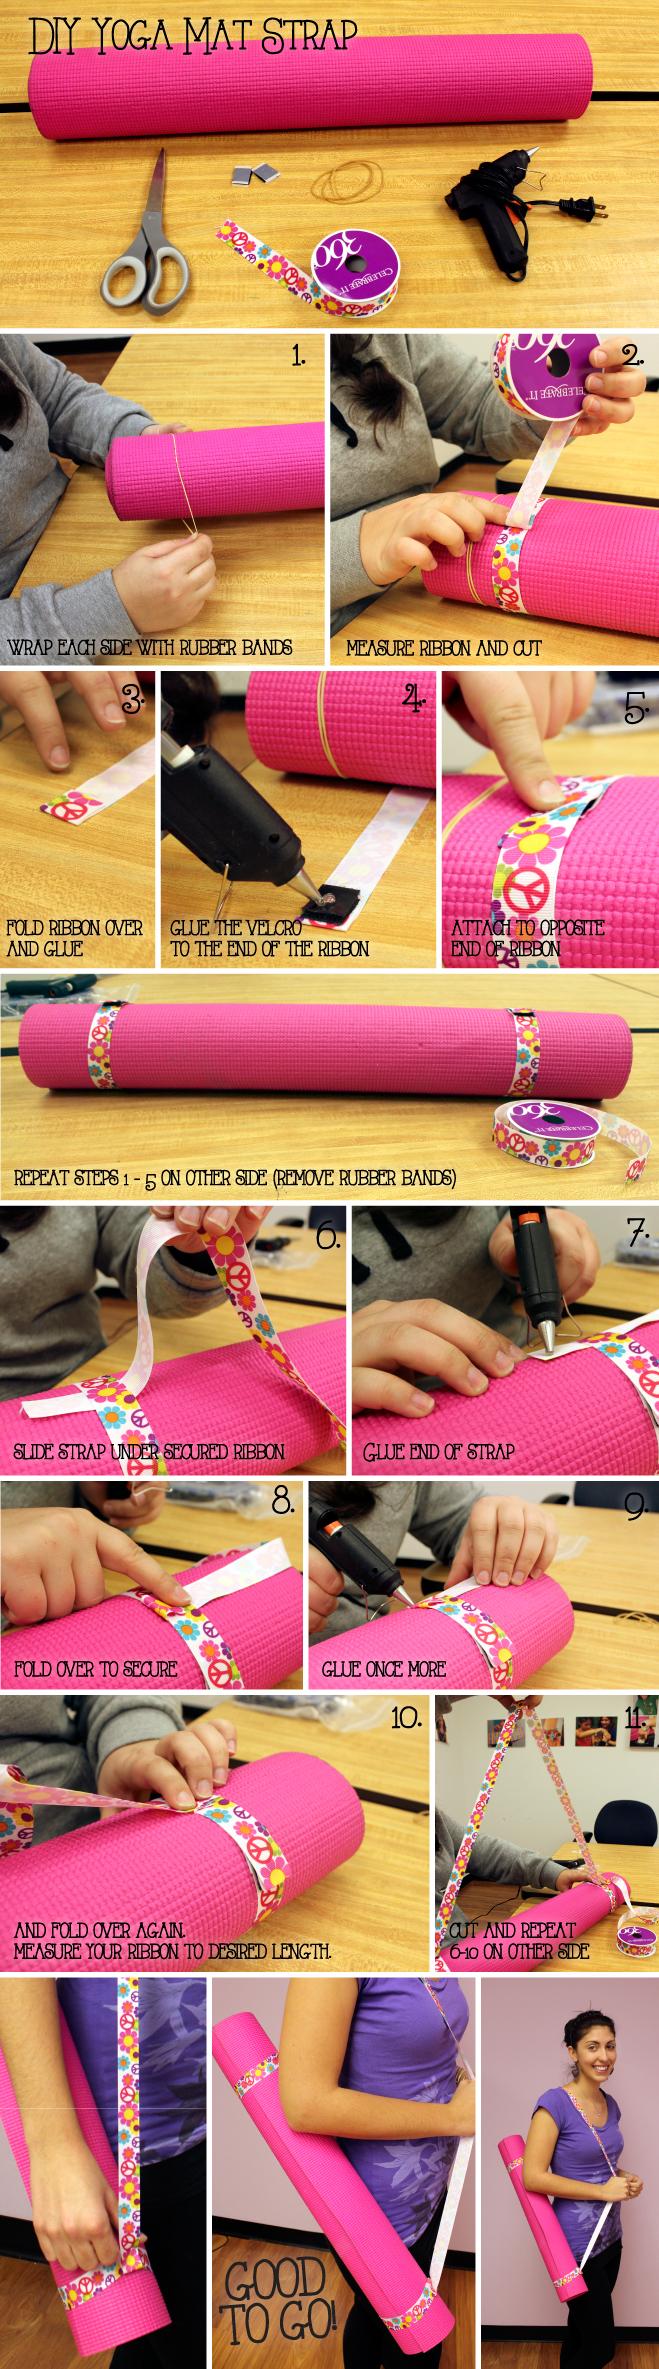 DIY Yoga mat strap